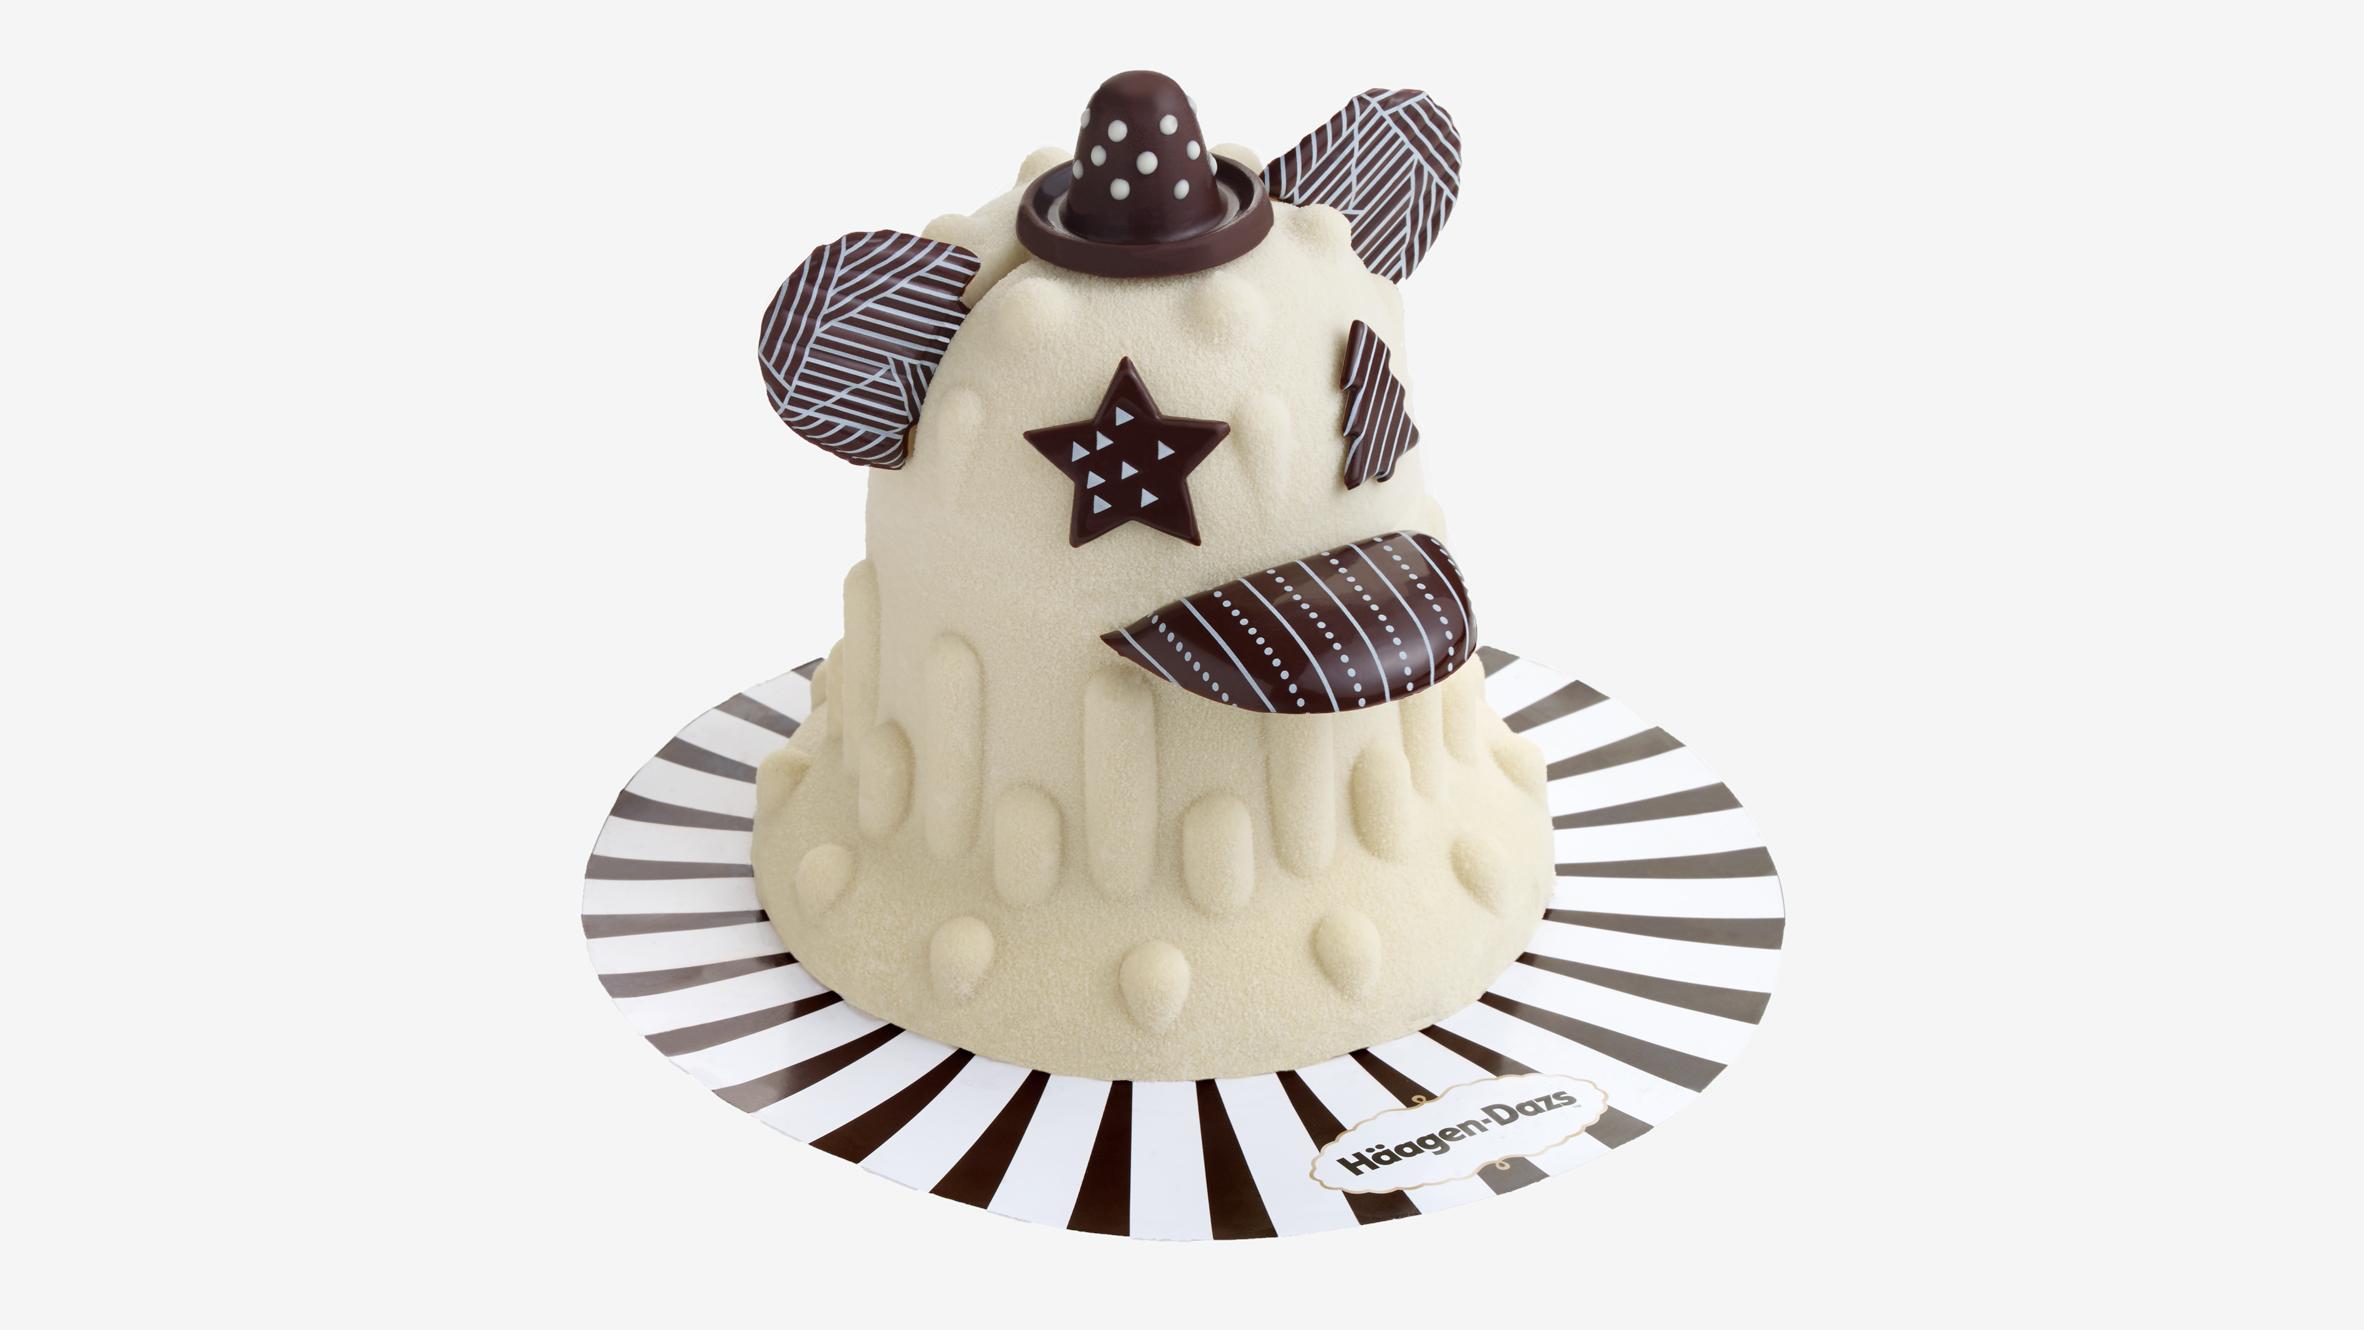 haagen-dazs-jaime-hayon-christmas-cake